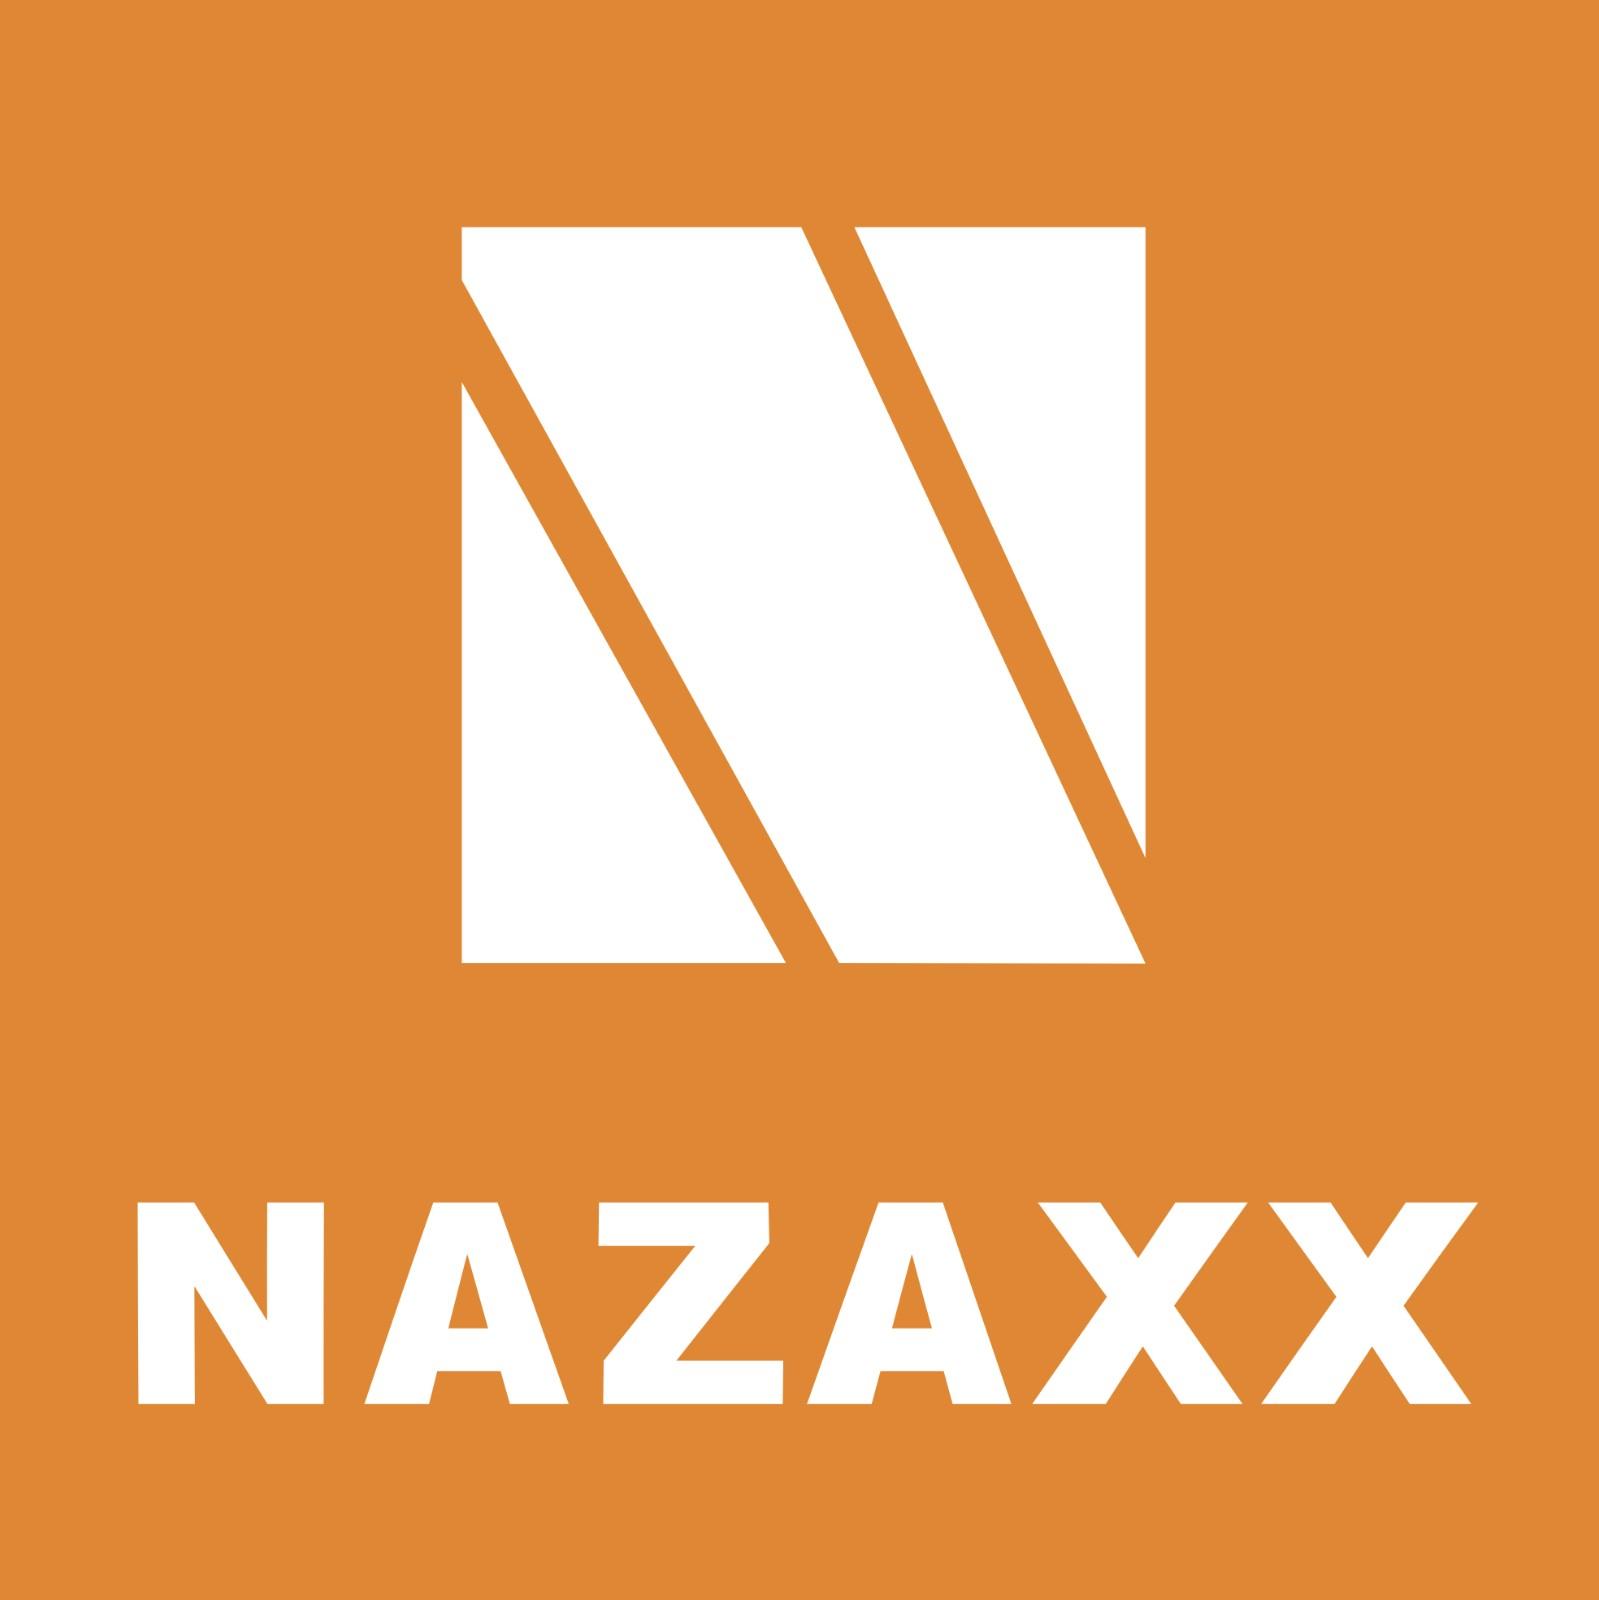 CHONGQING NAZAXX INTERNATIONAL TRADING CO.,LTD.